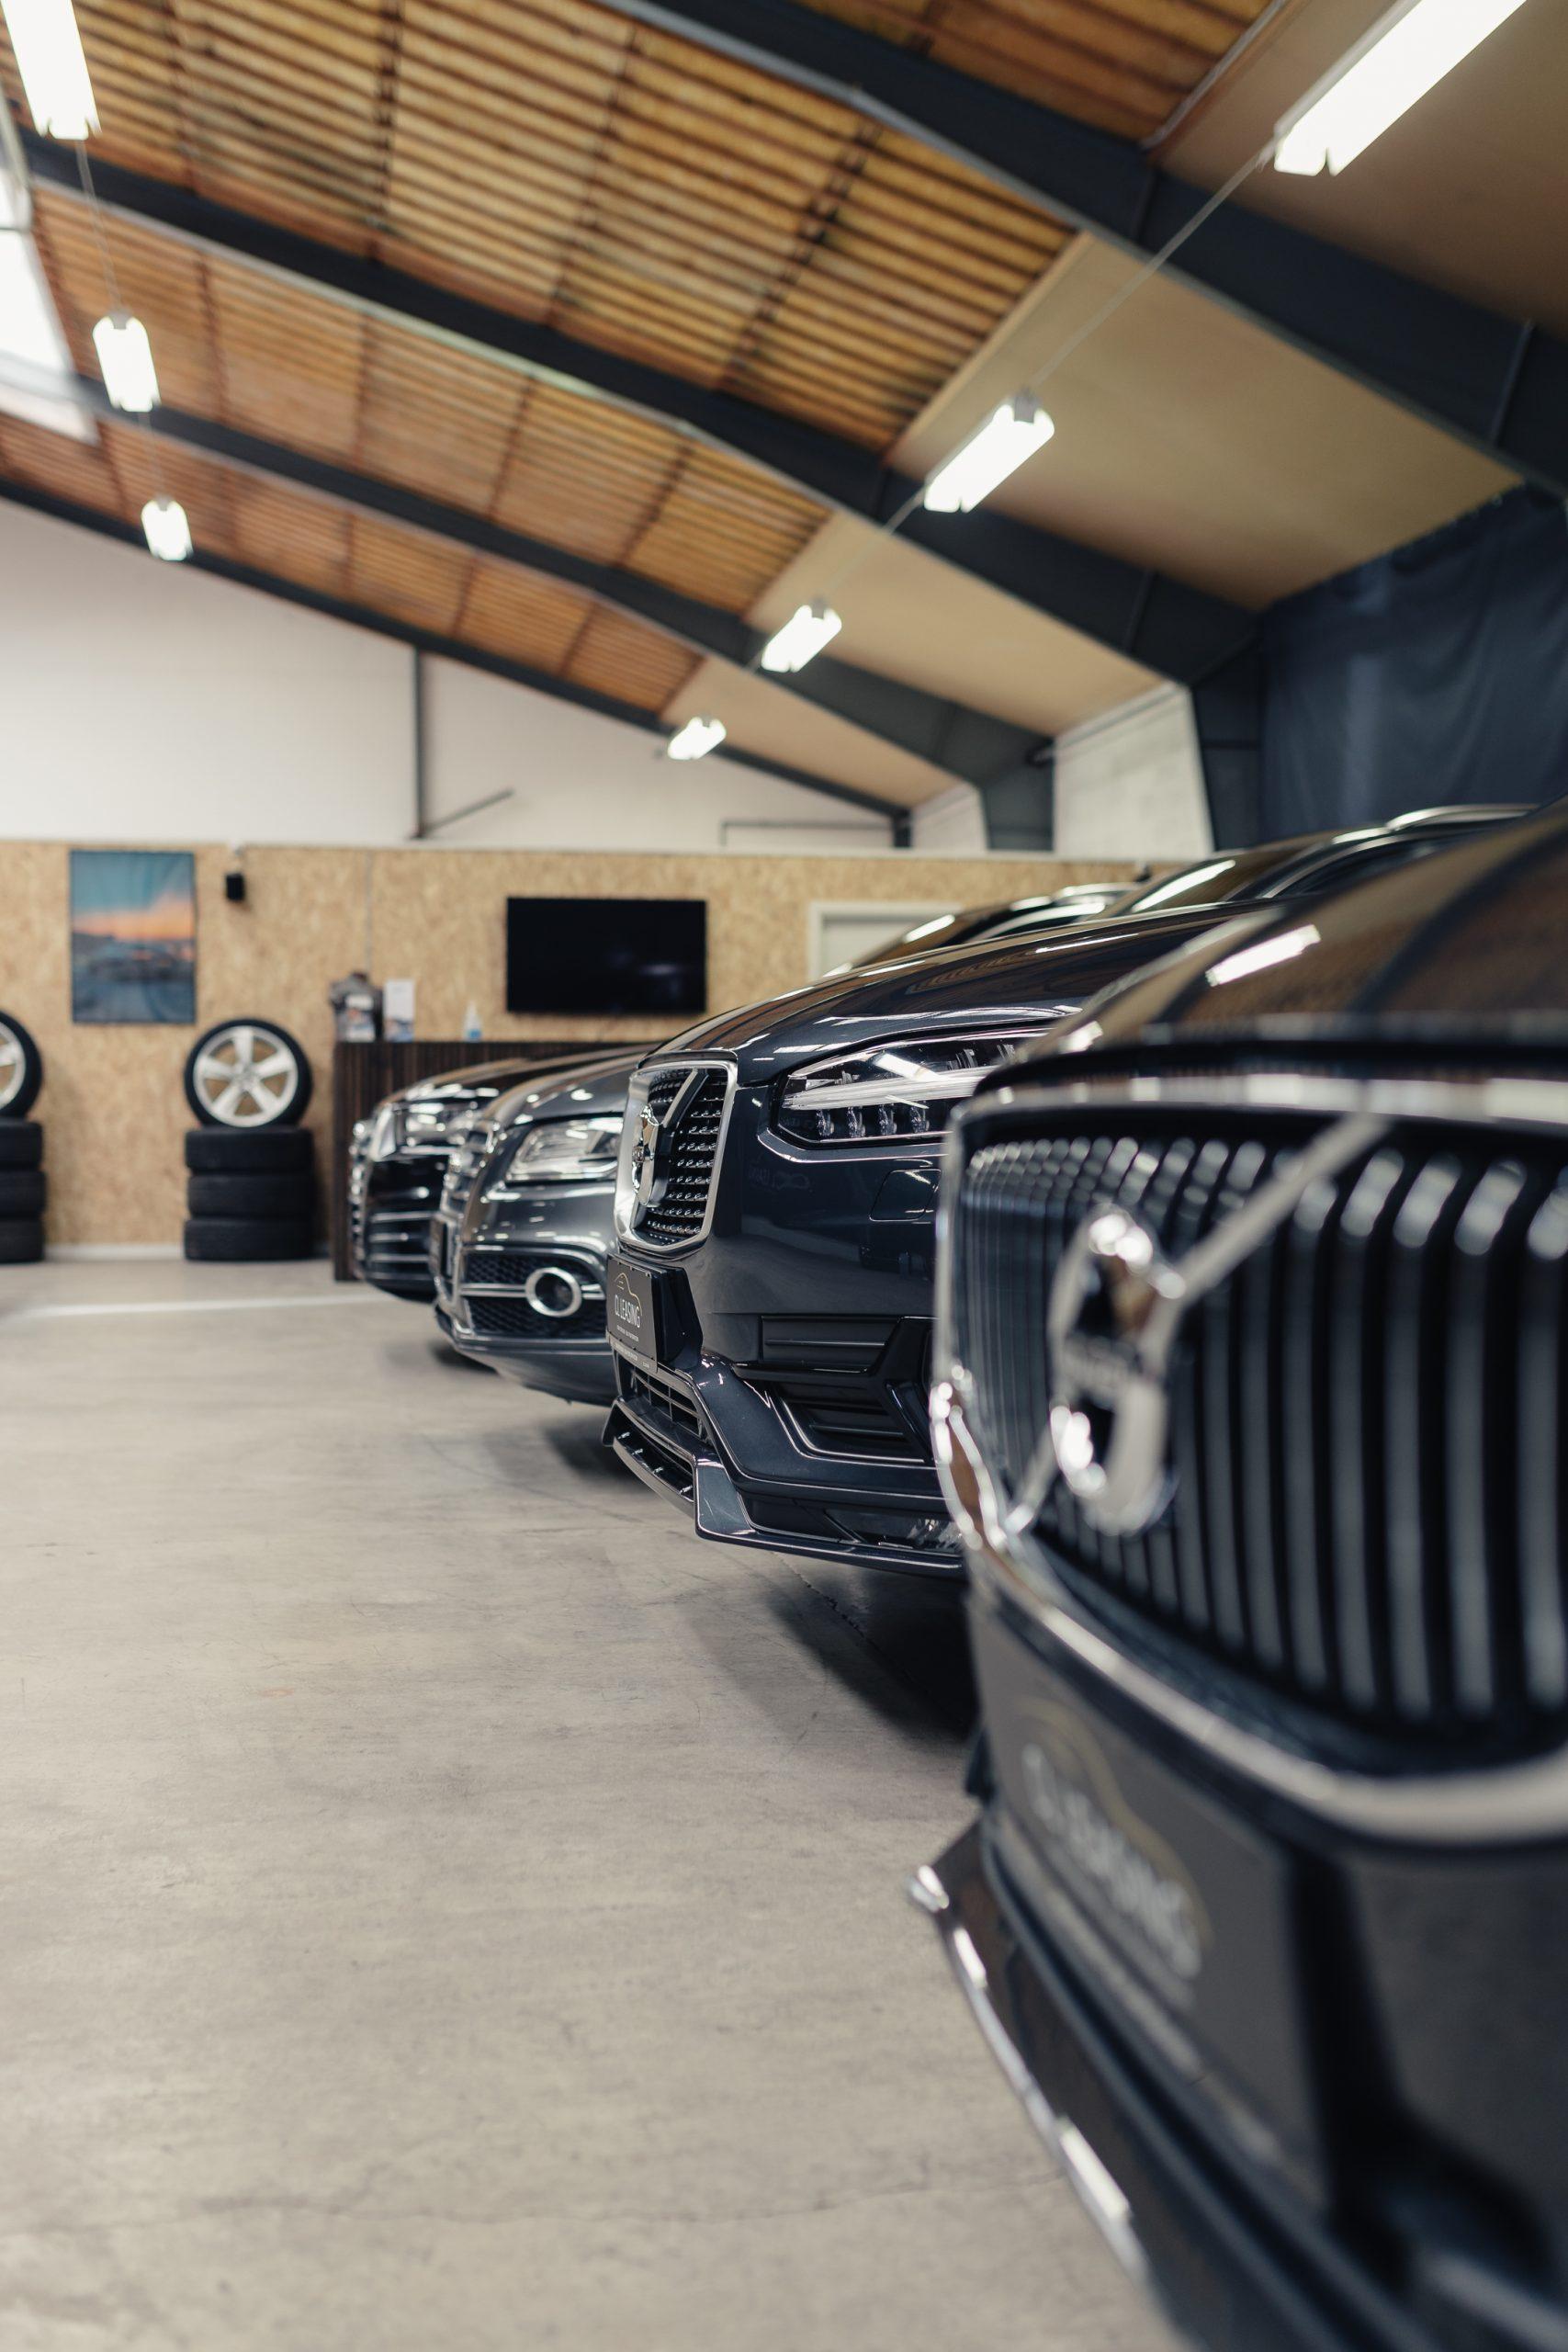 Fede biler med ekstraordinær service: CL Leasing har fået en flyvende start